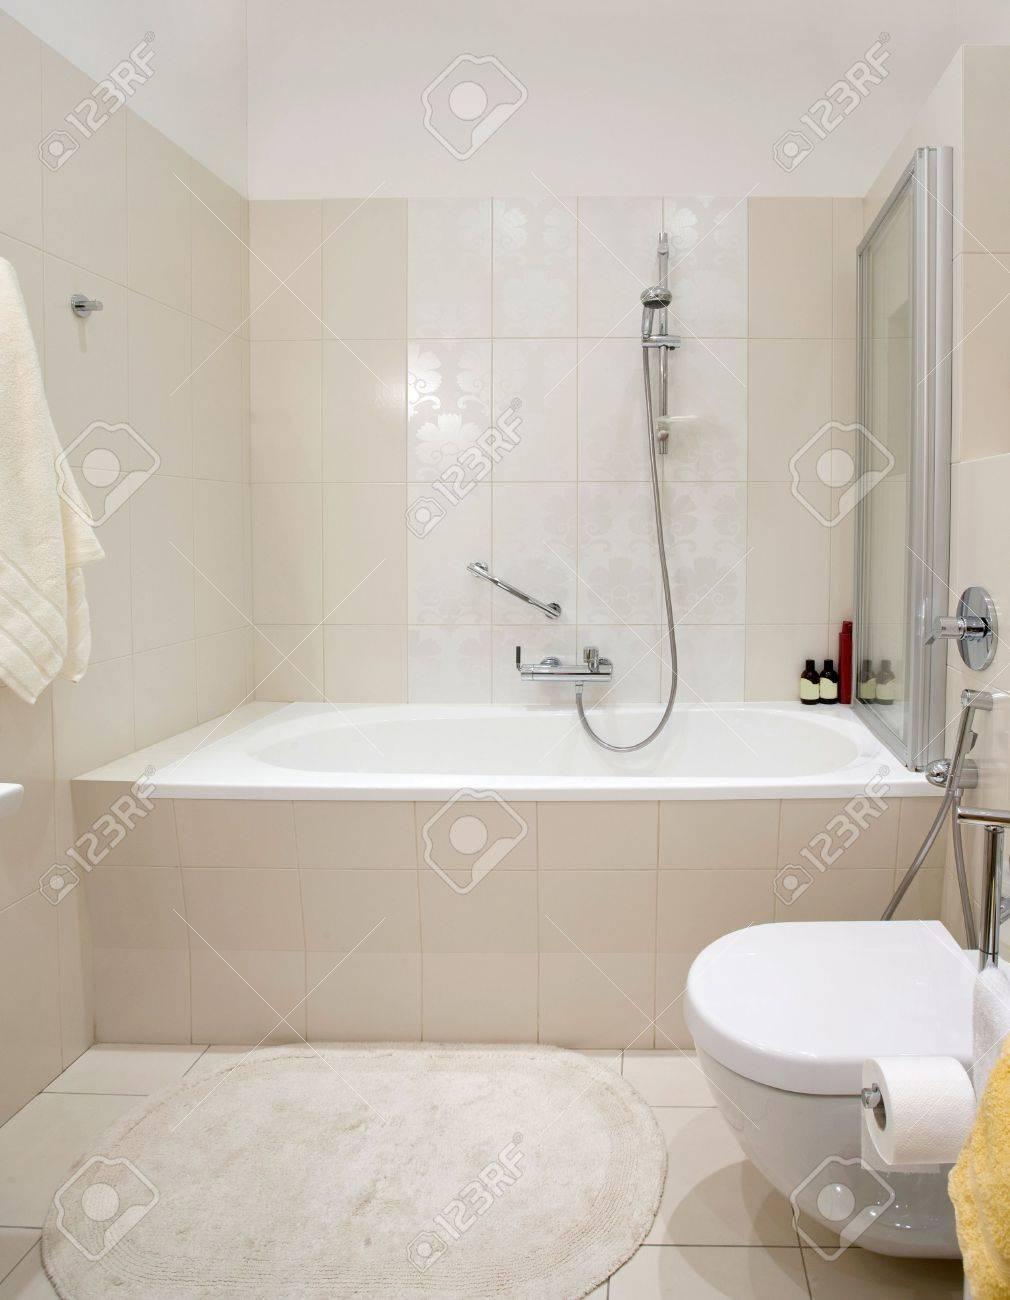 Salle de bains moderne domestique. Céramique salle de bain avec douche.